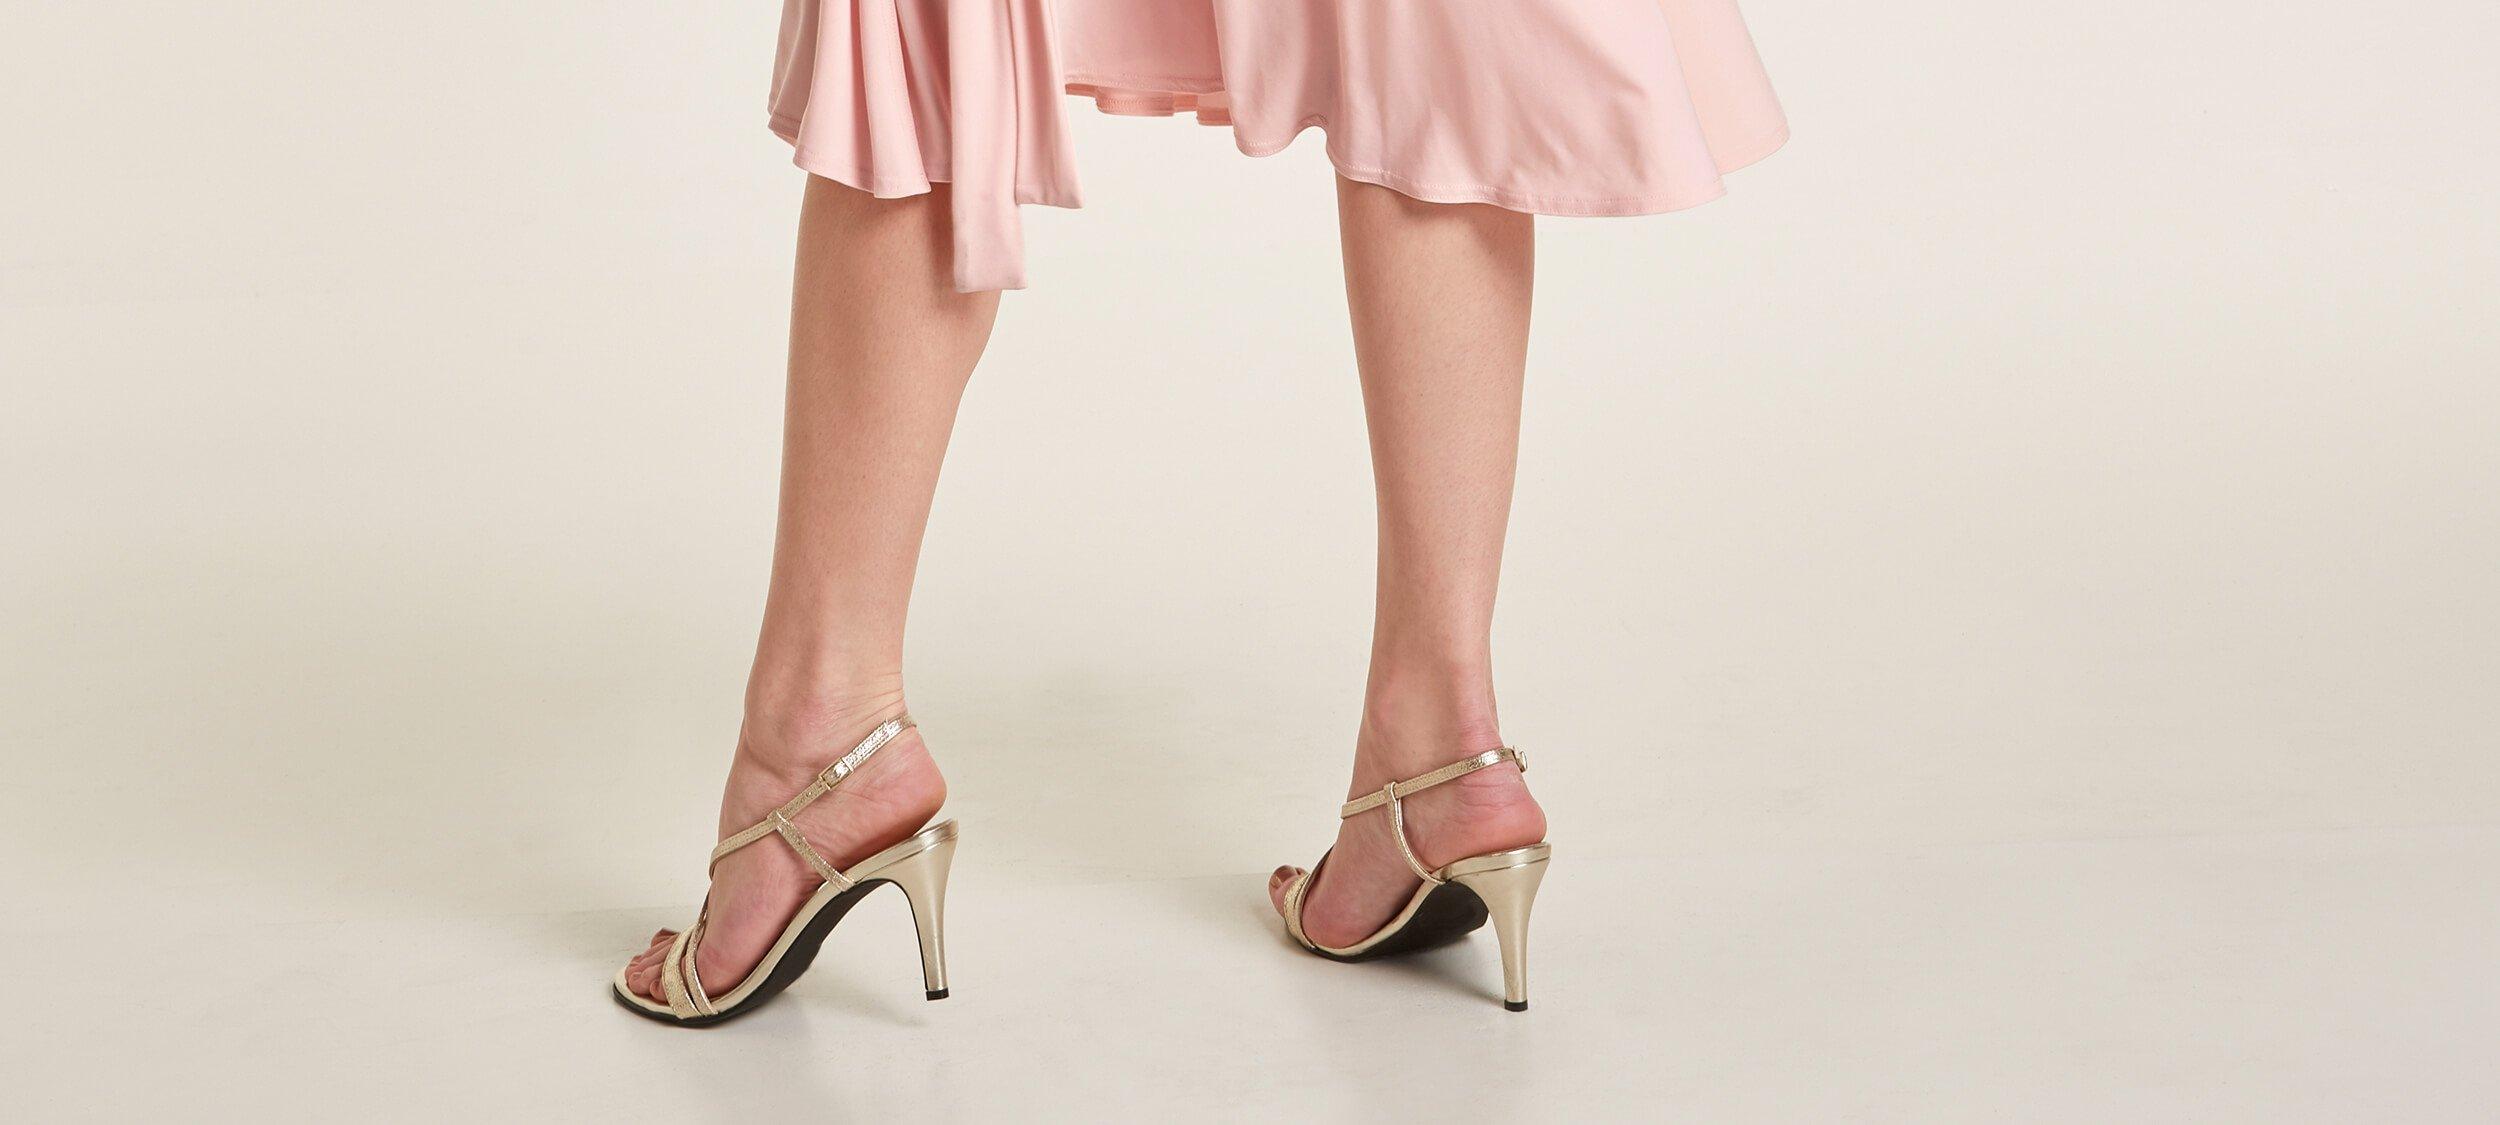 Frau trägt silberne Sandaletten.